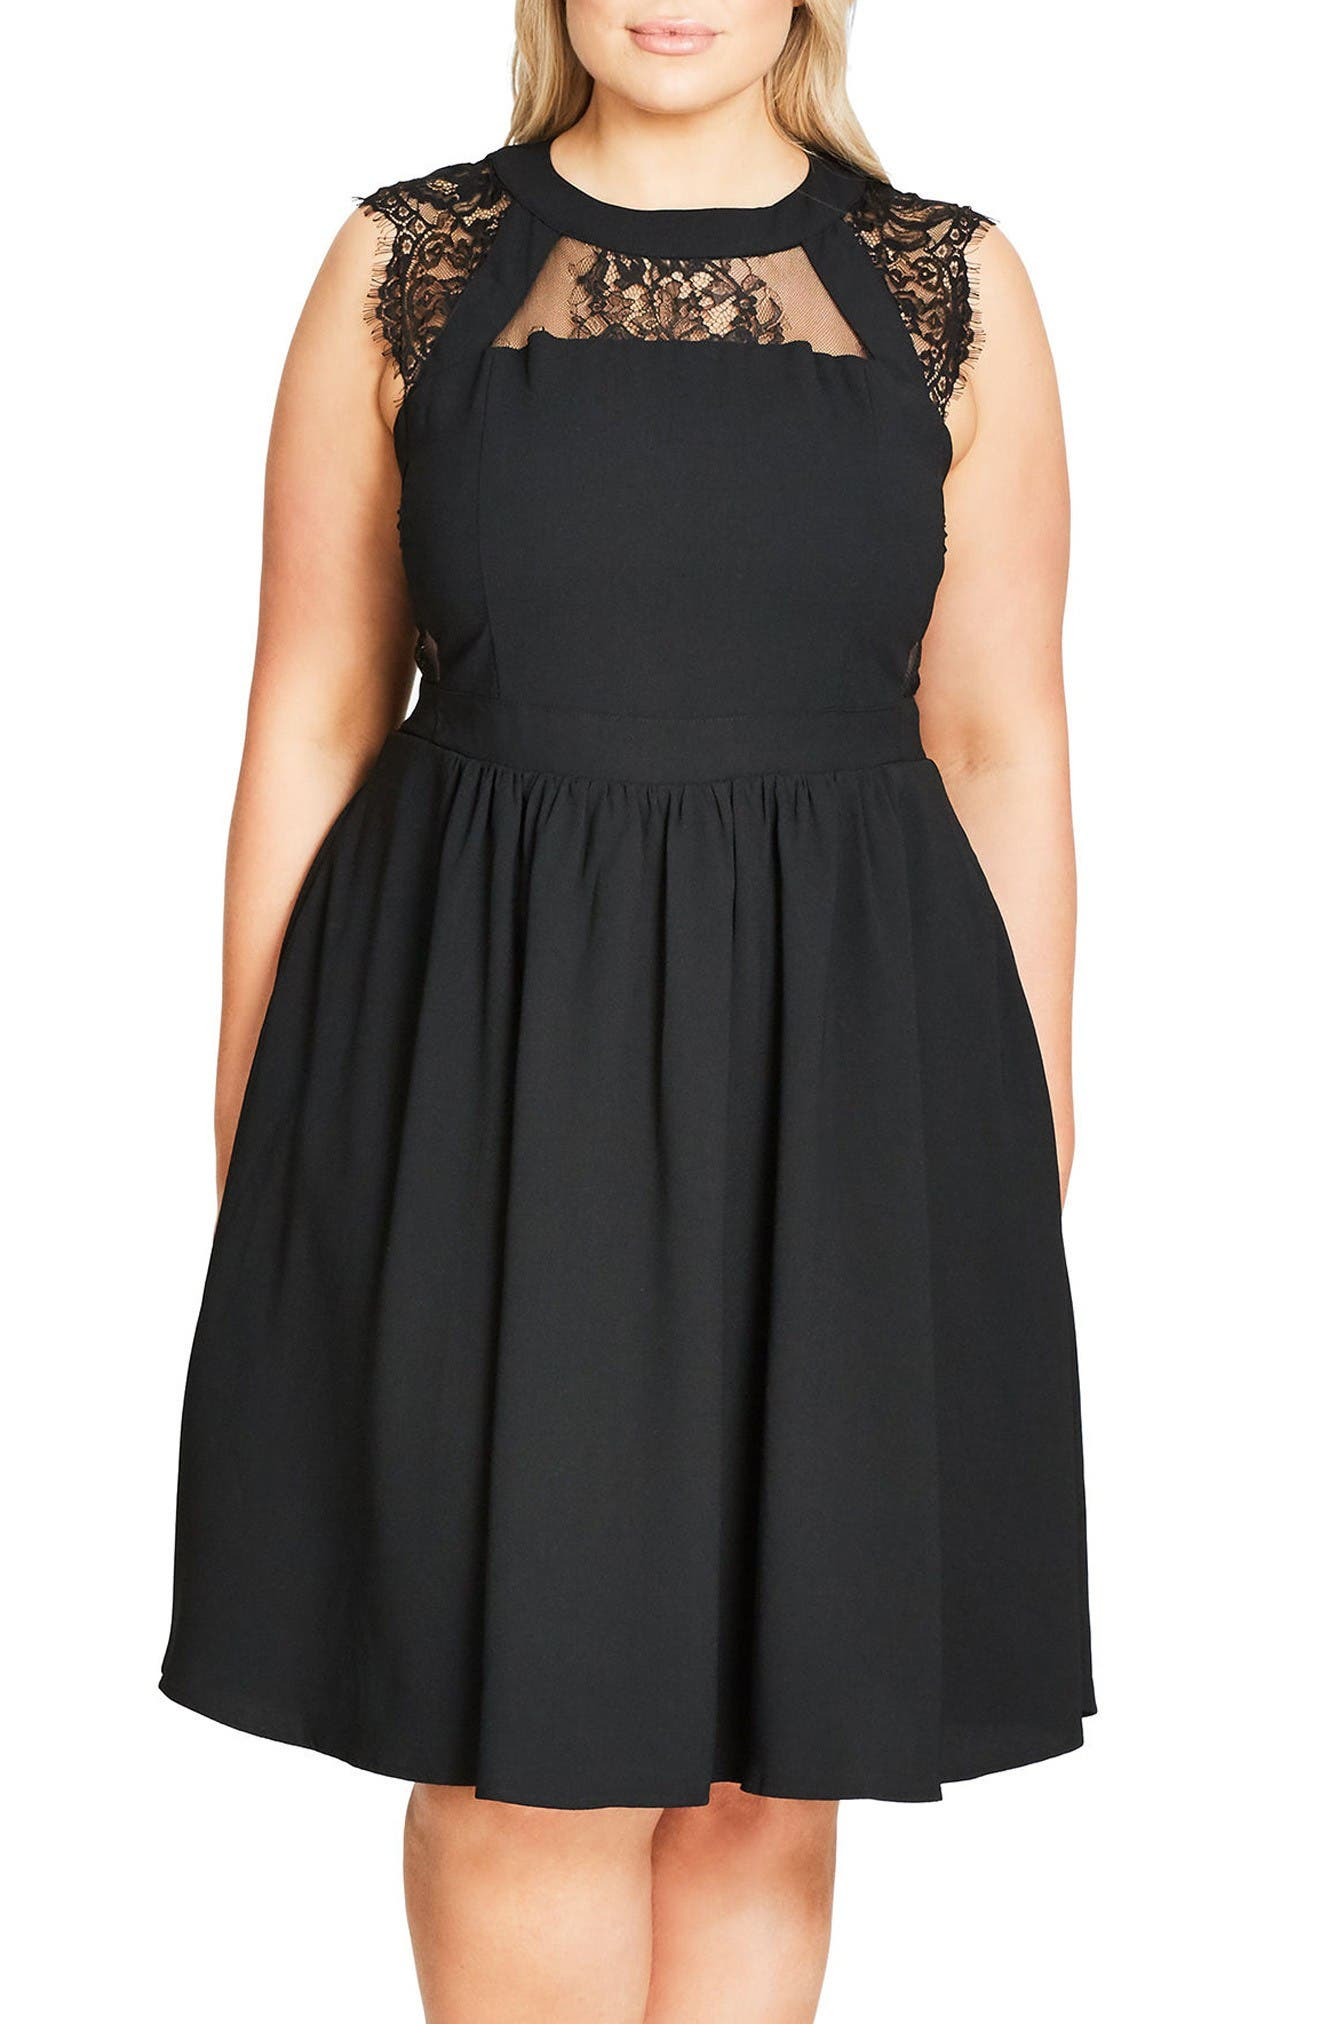 Cage Dress,                             Main thumbnail 1, color,                             Black